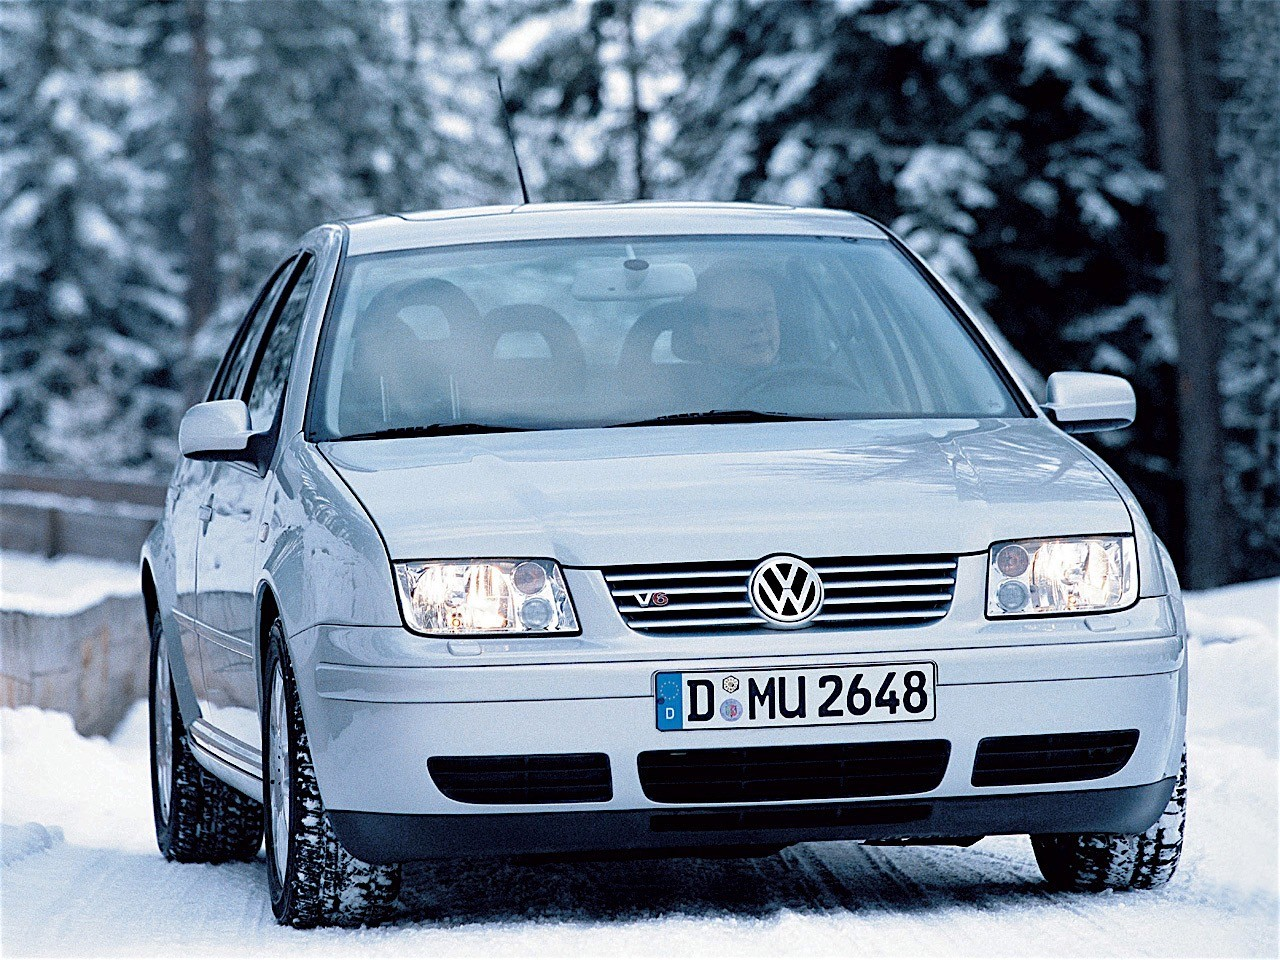 VOLKSWAGEN Bora specs - 1998, 1999, 2000, 2001, 2002, 2003, 2004, 2005 - autoevolution